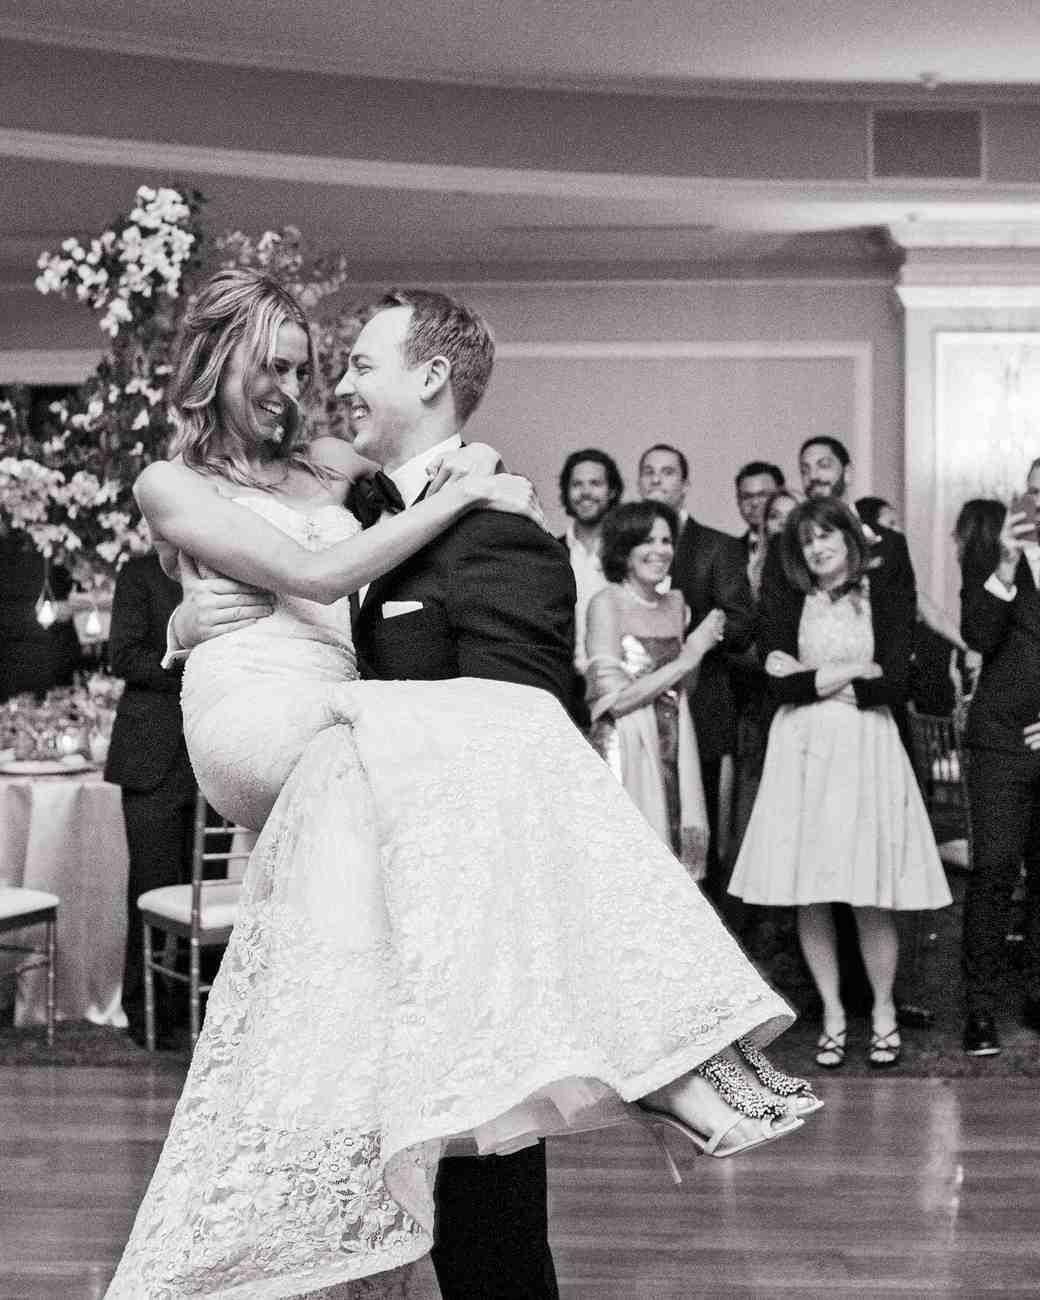 rebecca-david-wedding-new-york-bride-groom-dancing-523-d112241.jpg